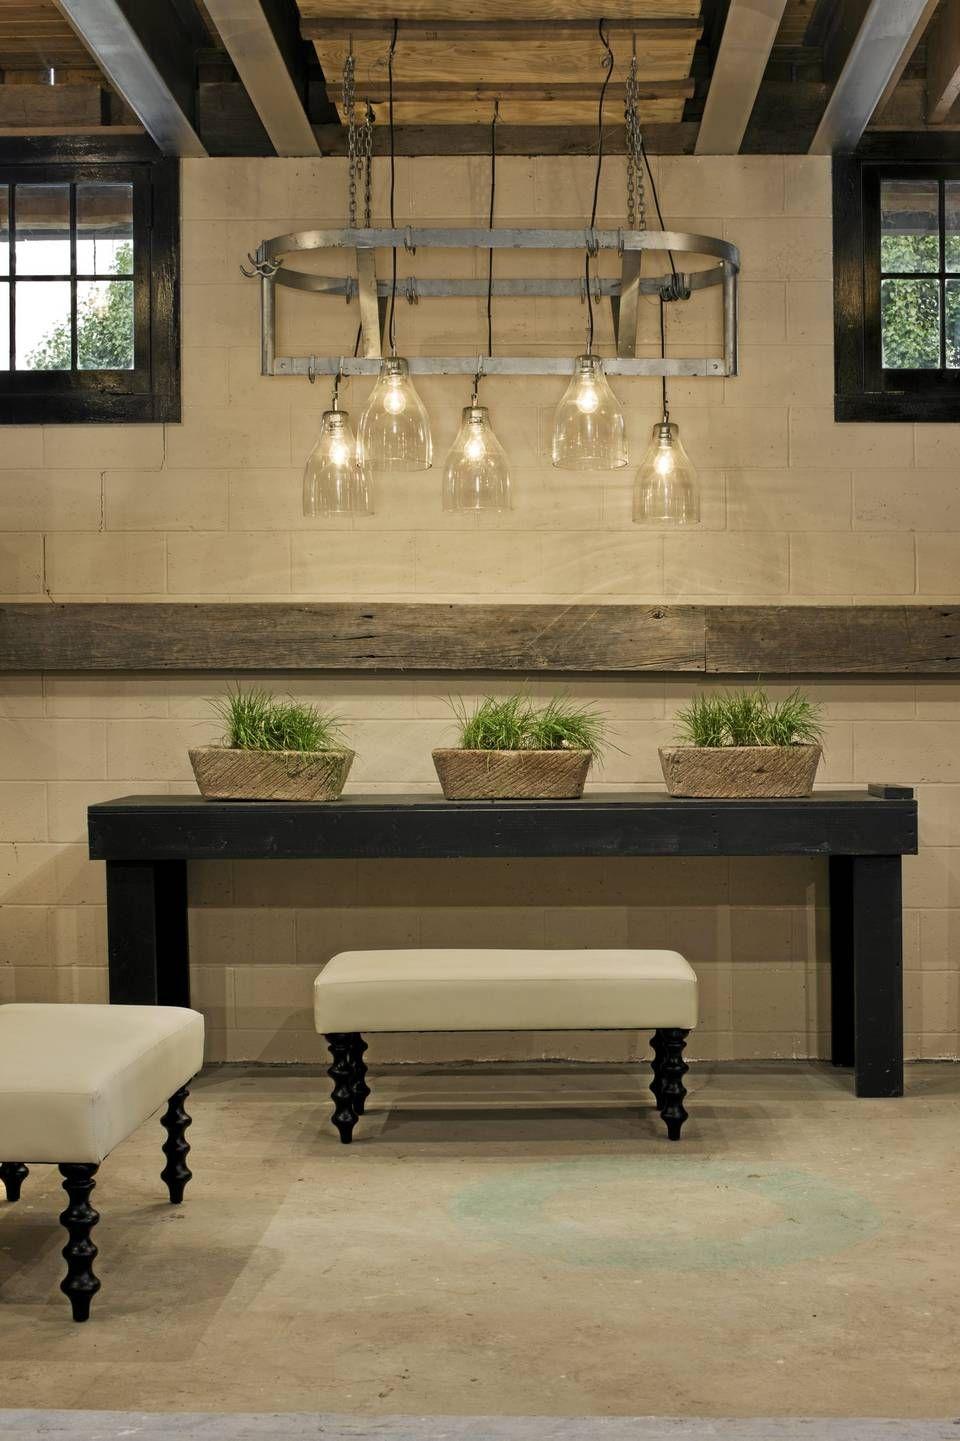 20 Amazing Unfinished Basement Ideas You Should Try Concrete Basement Walls Cinder Block Walls Basement Makeover